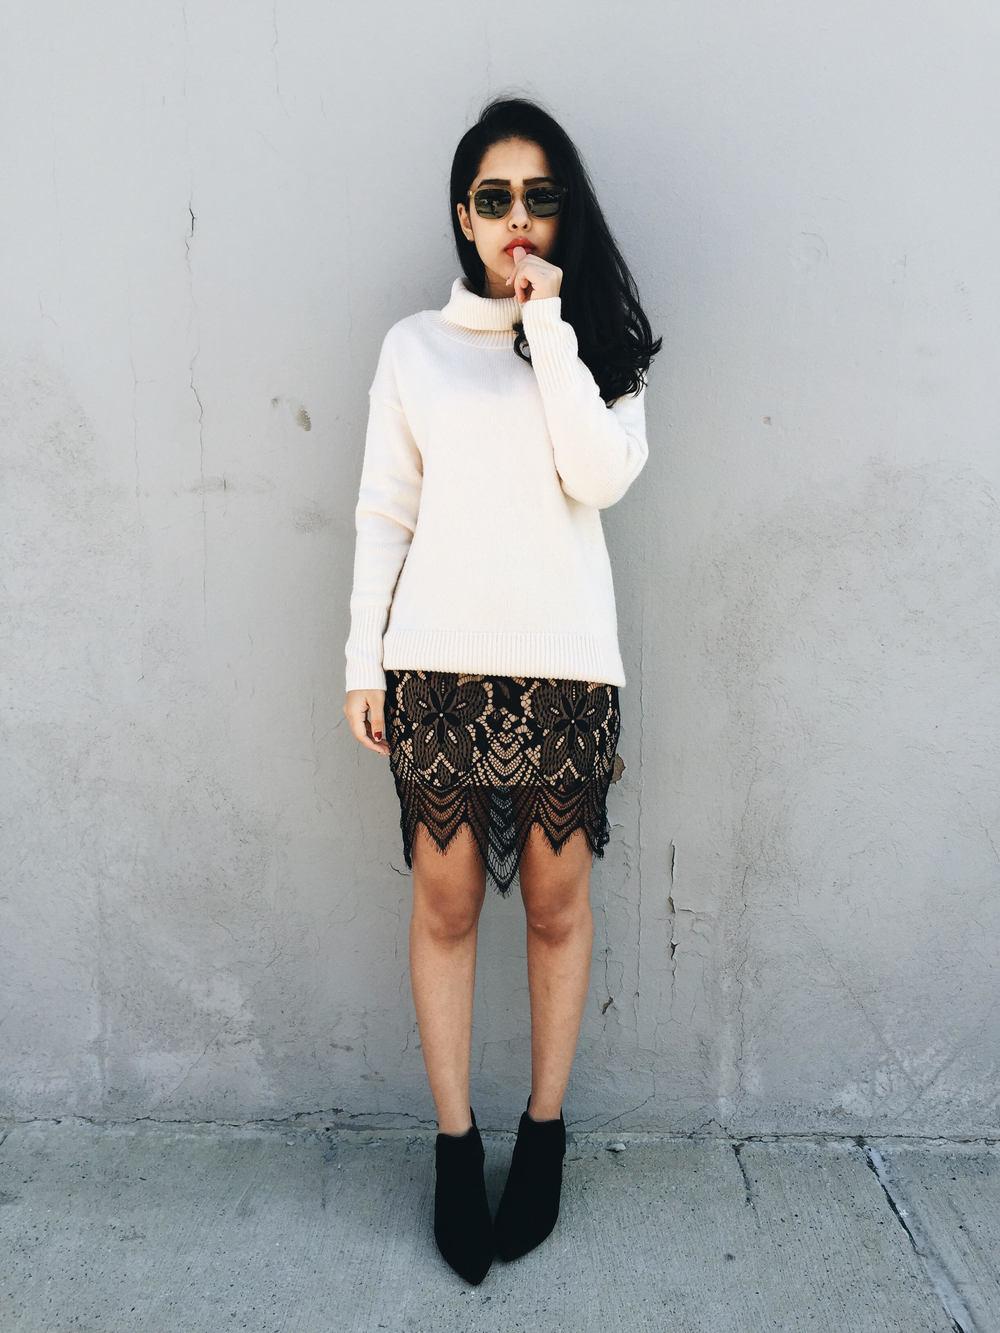 arushi khosla, arushi.co, shop tobi, tobi.com, lace skirt, for love and lemons, ootd, williamsburg, brooklyn